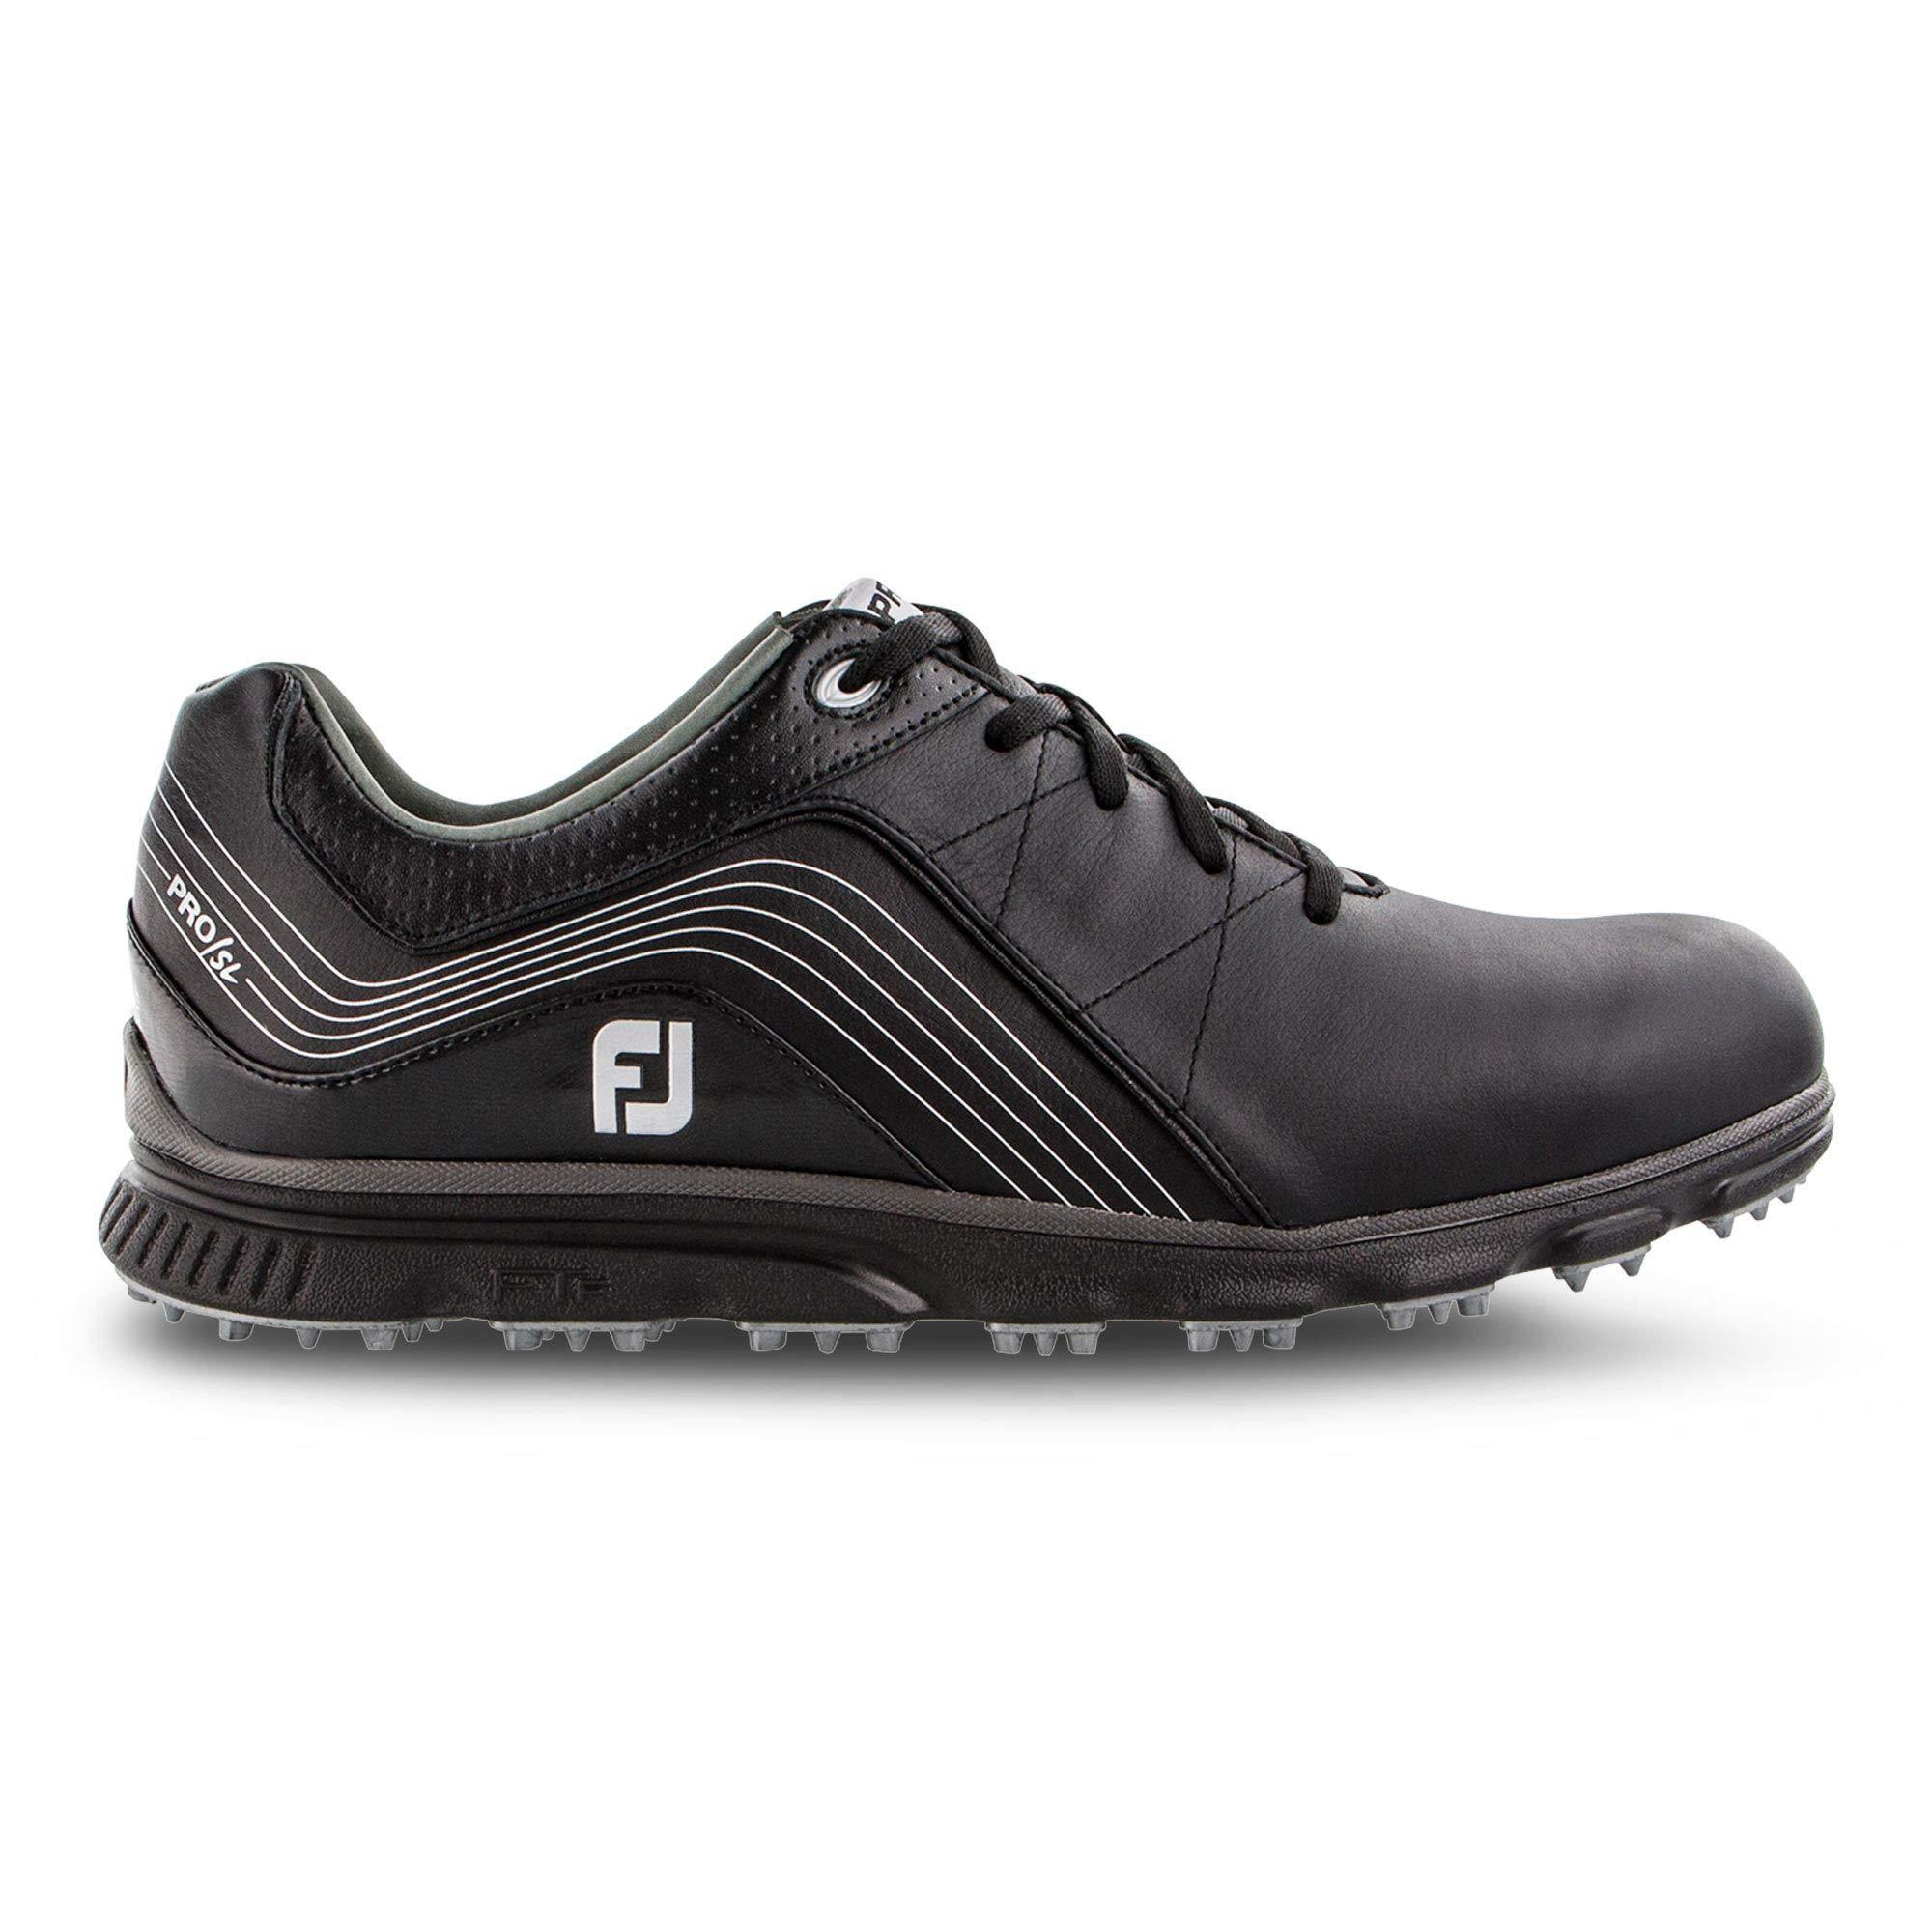 FootJoy Men's Pro/SL Golf Shoes Black 12 M US by FootJoy